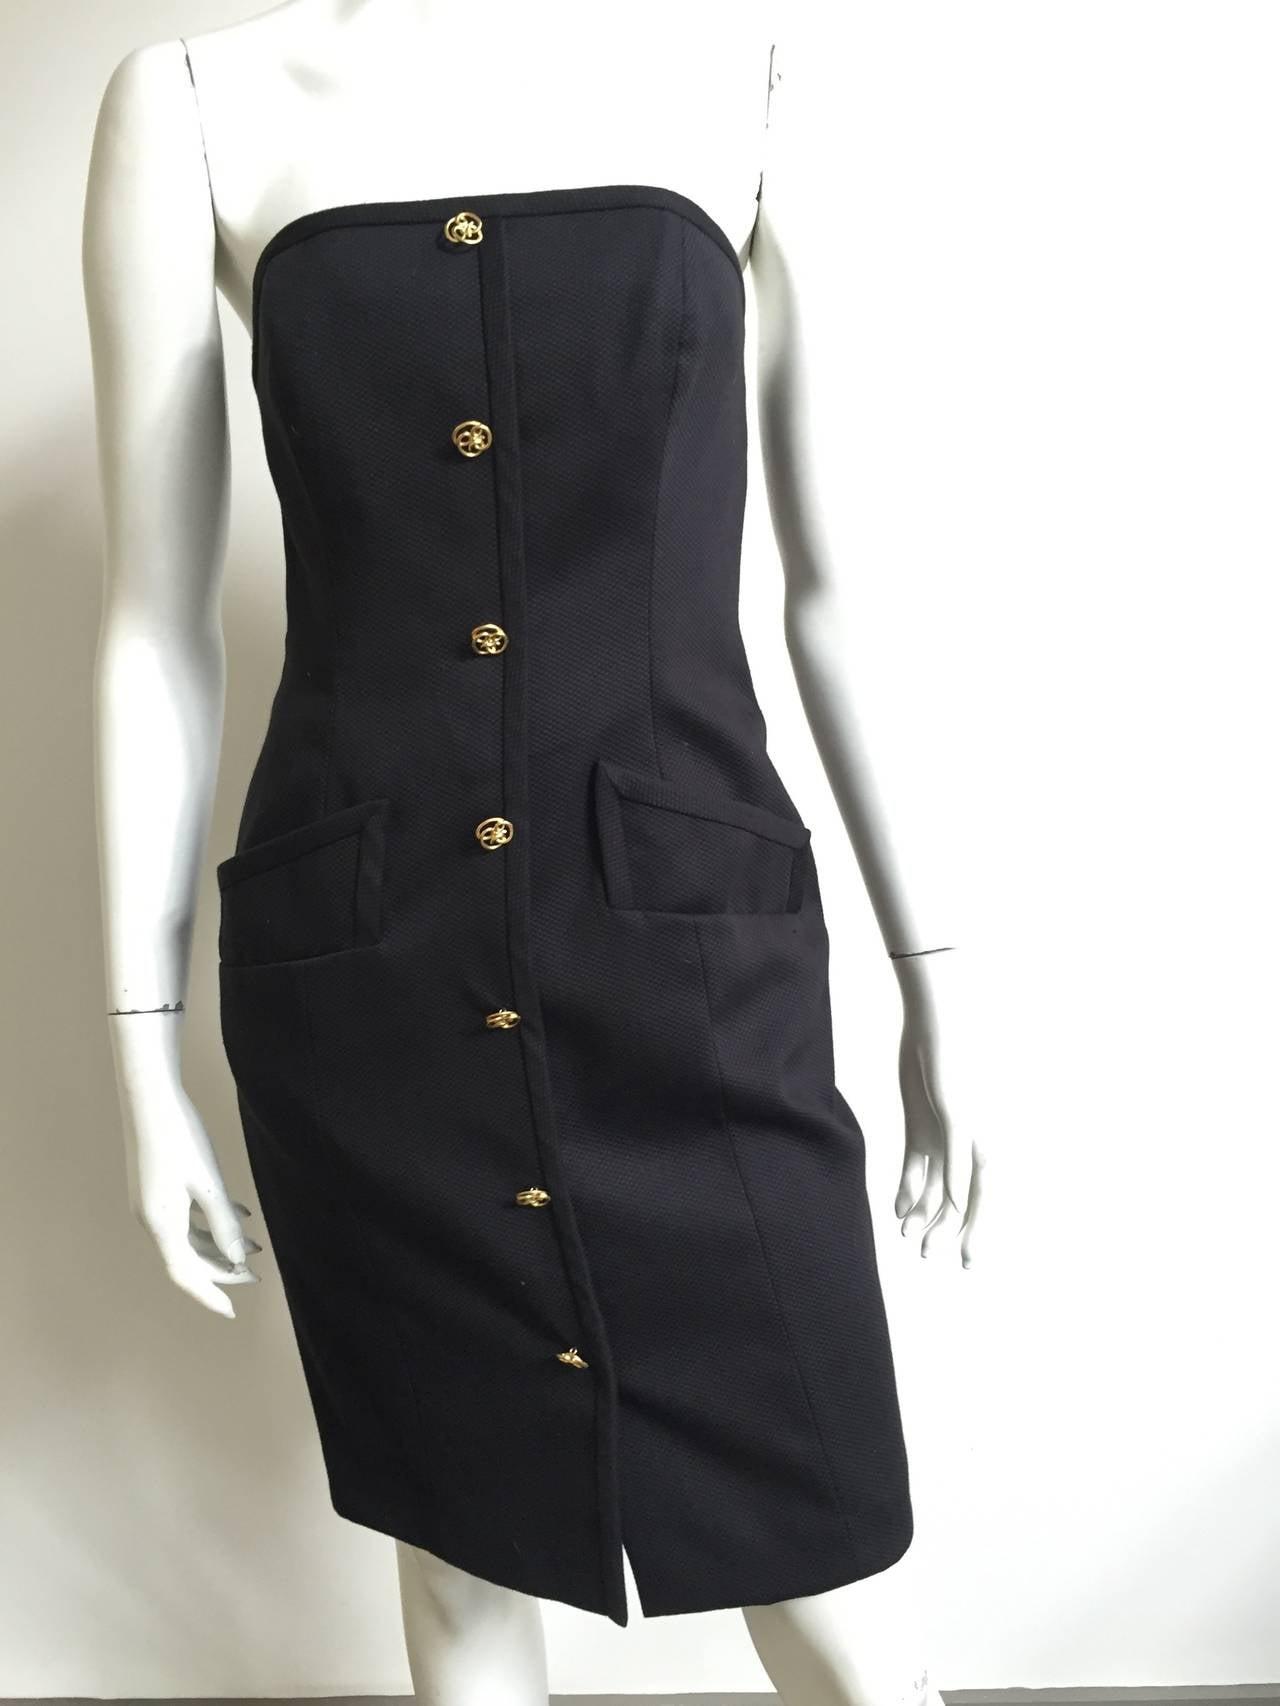 Bill Blass 90s Black Strapless Dress With Pockets Size 4. 9